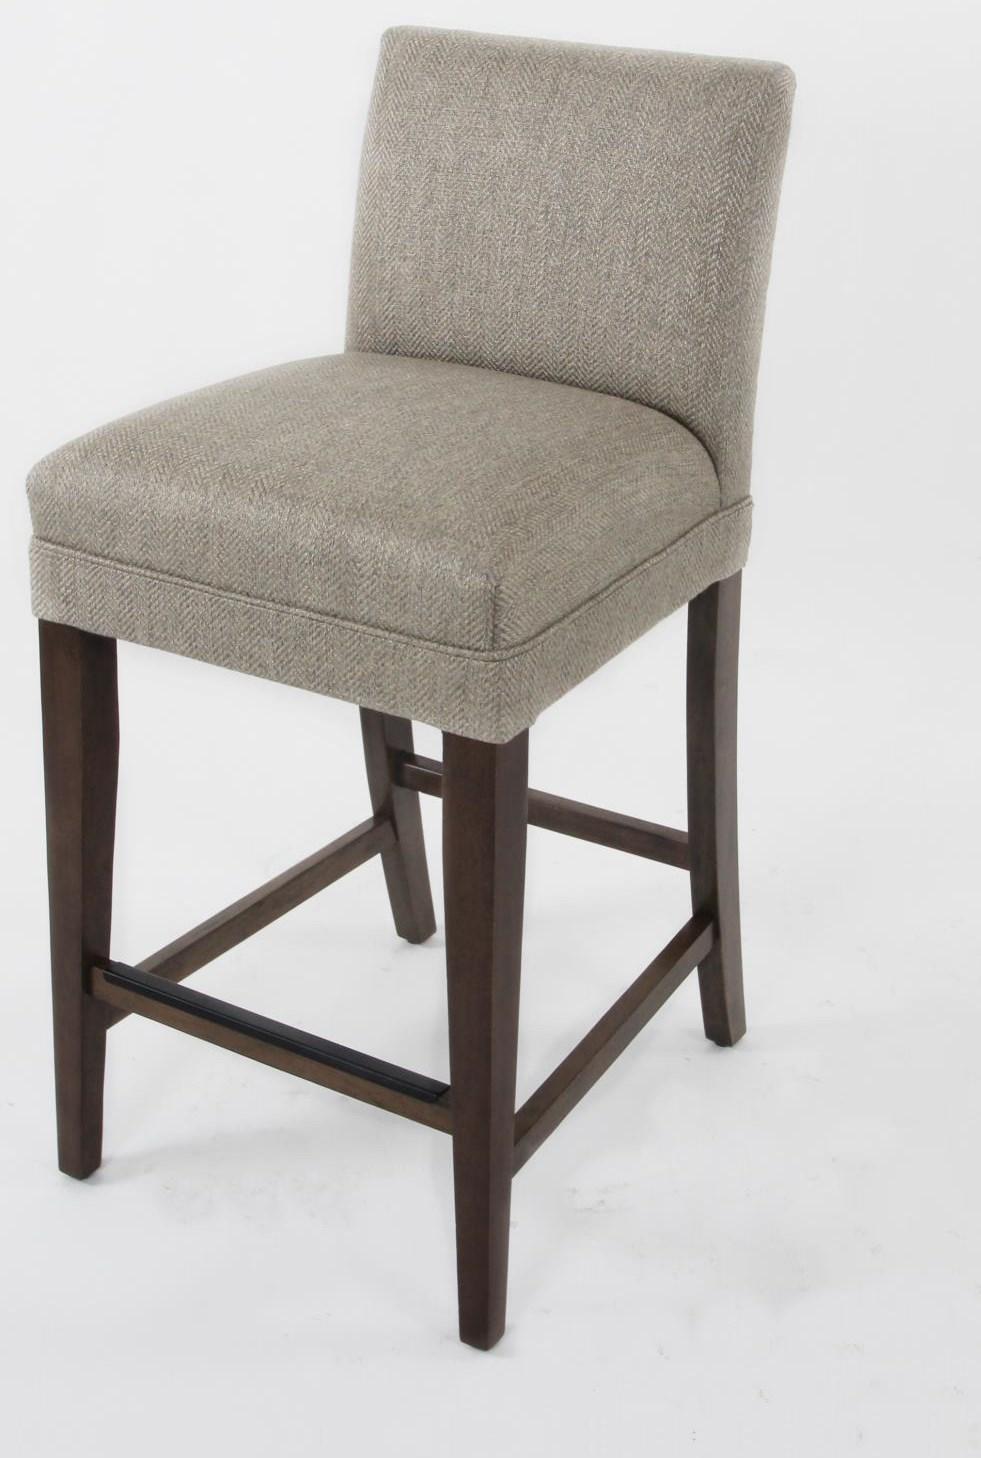 Accent Bar Stool by CMI at Sprintz Furniture